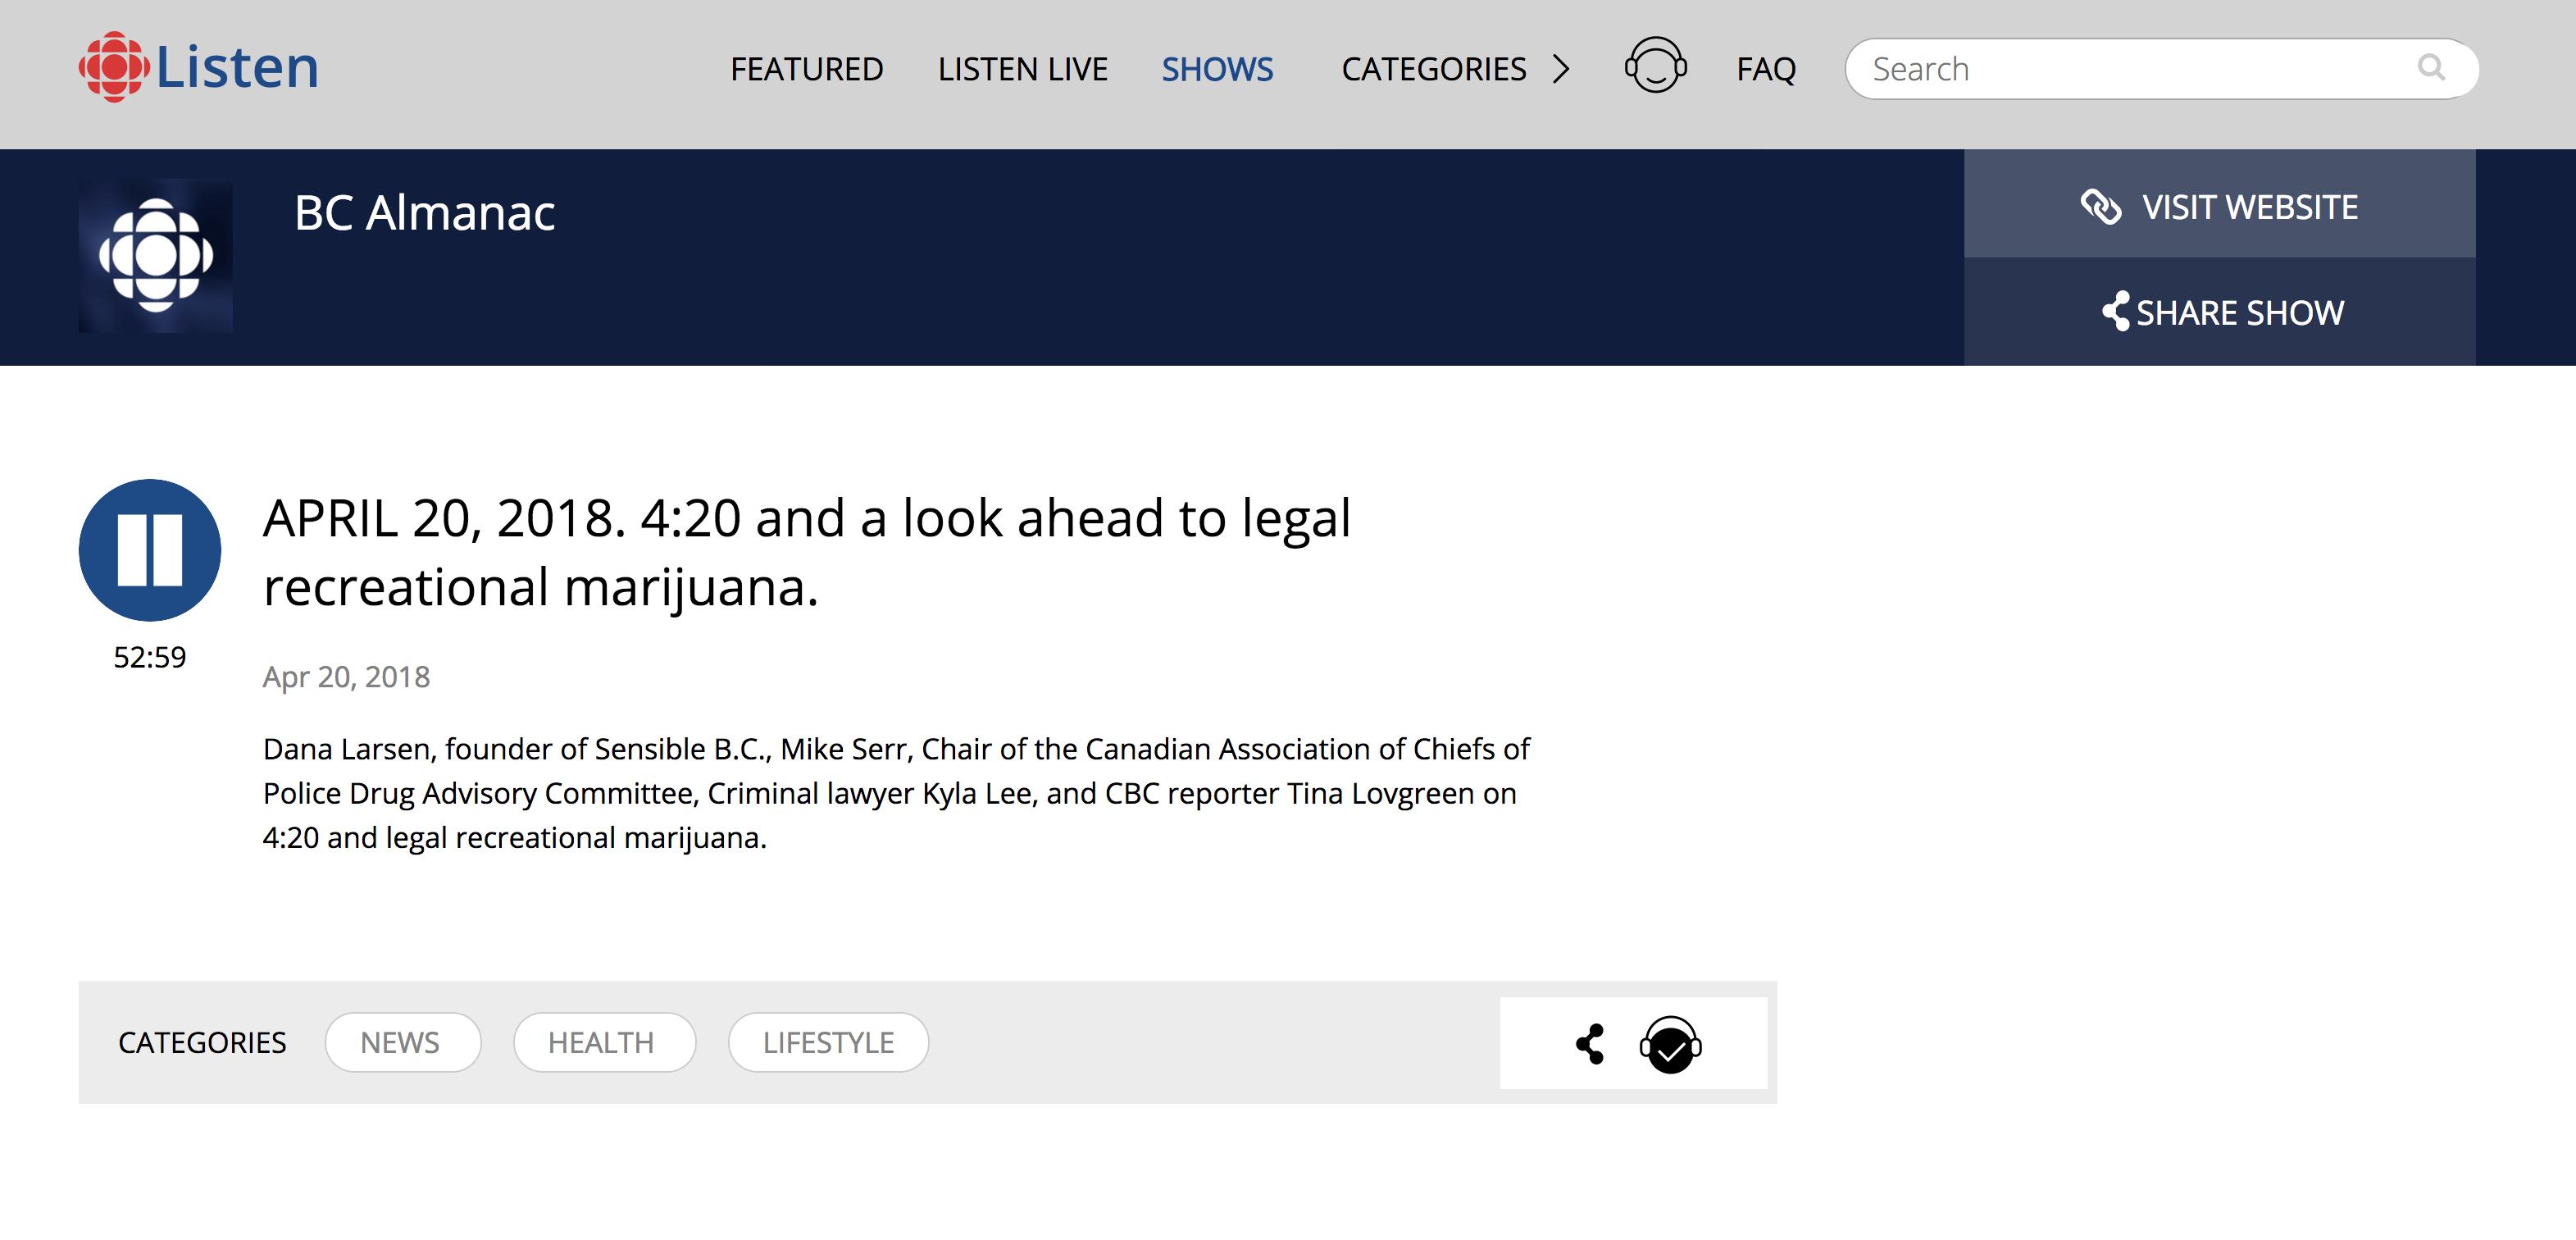 Kyla Lee on CBC's BC Almanac